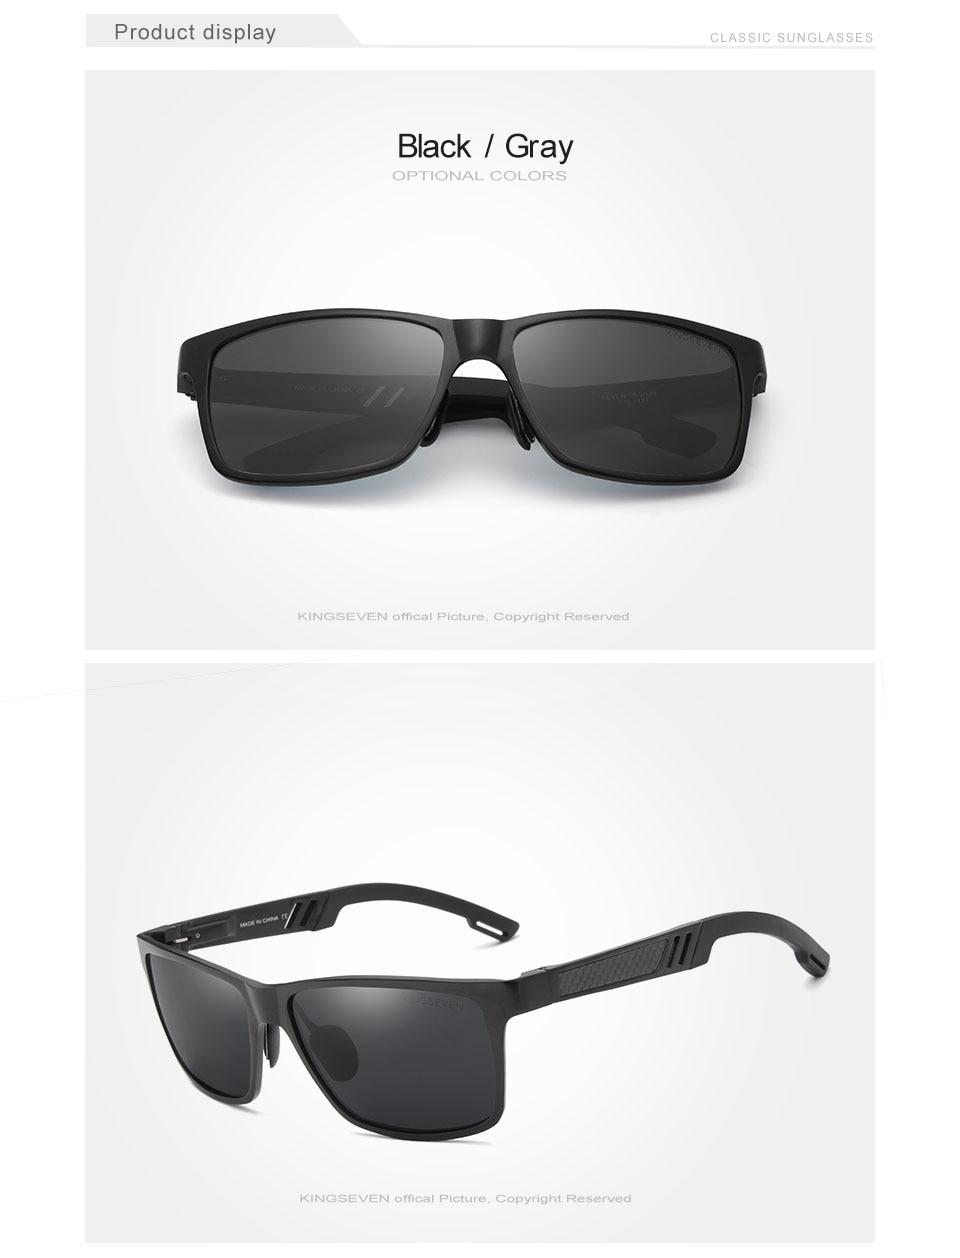 HTB1fQlMeAfb uJkHFJHq6z4vFXao - KINGSEVEN Men Polarized Sunglasses Aluminum Magnesium Sun Glasses Driving Glasses Rectangle Shades For Men Oculos masculino Male